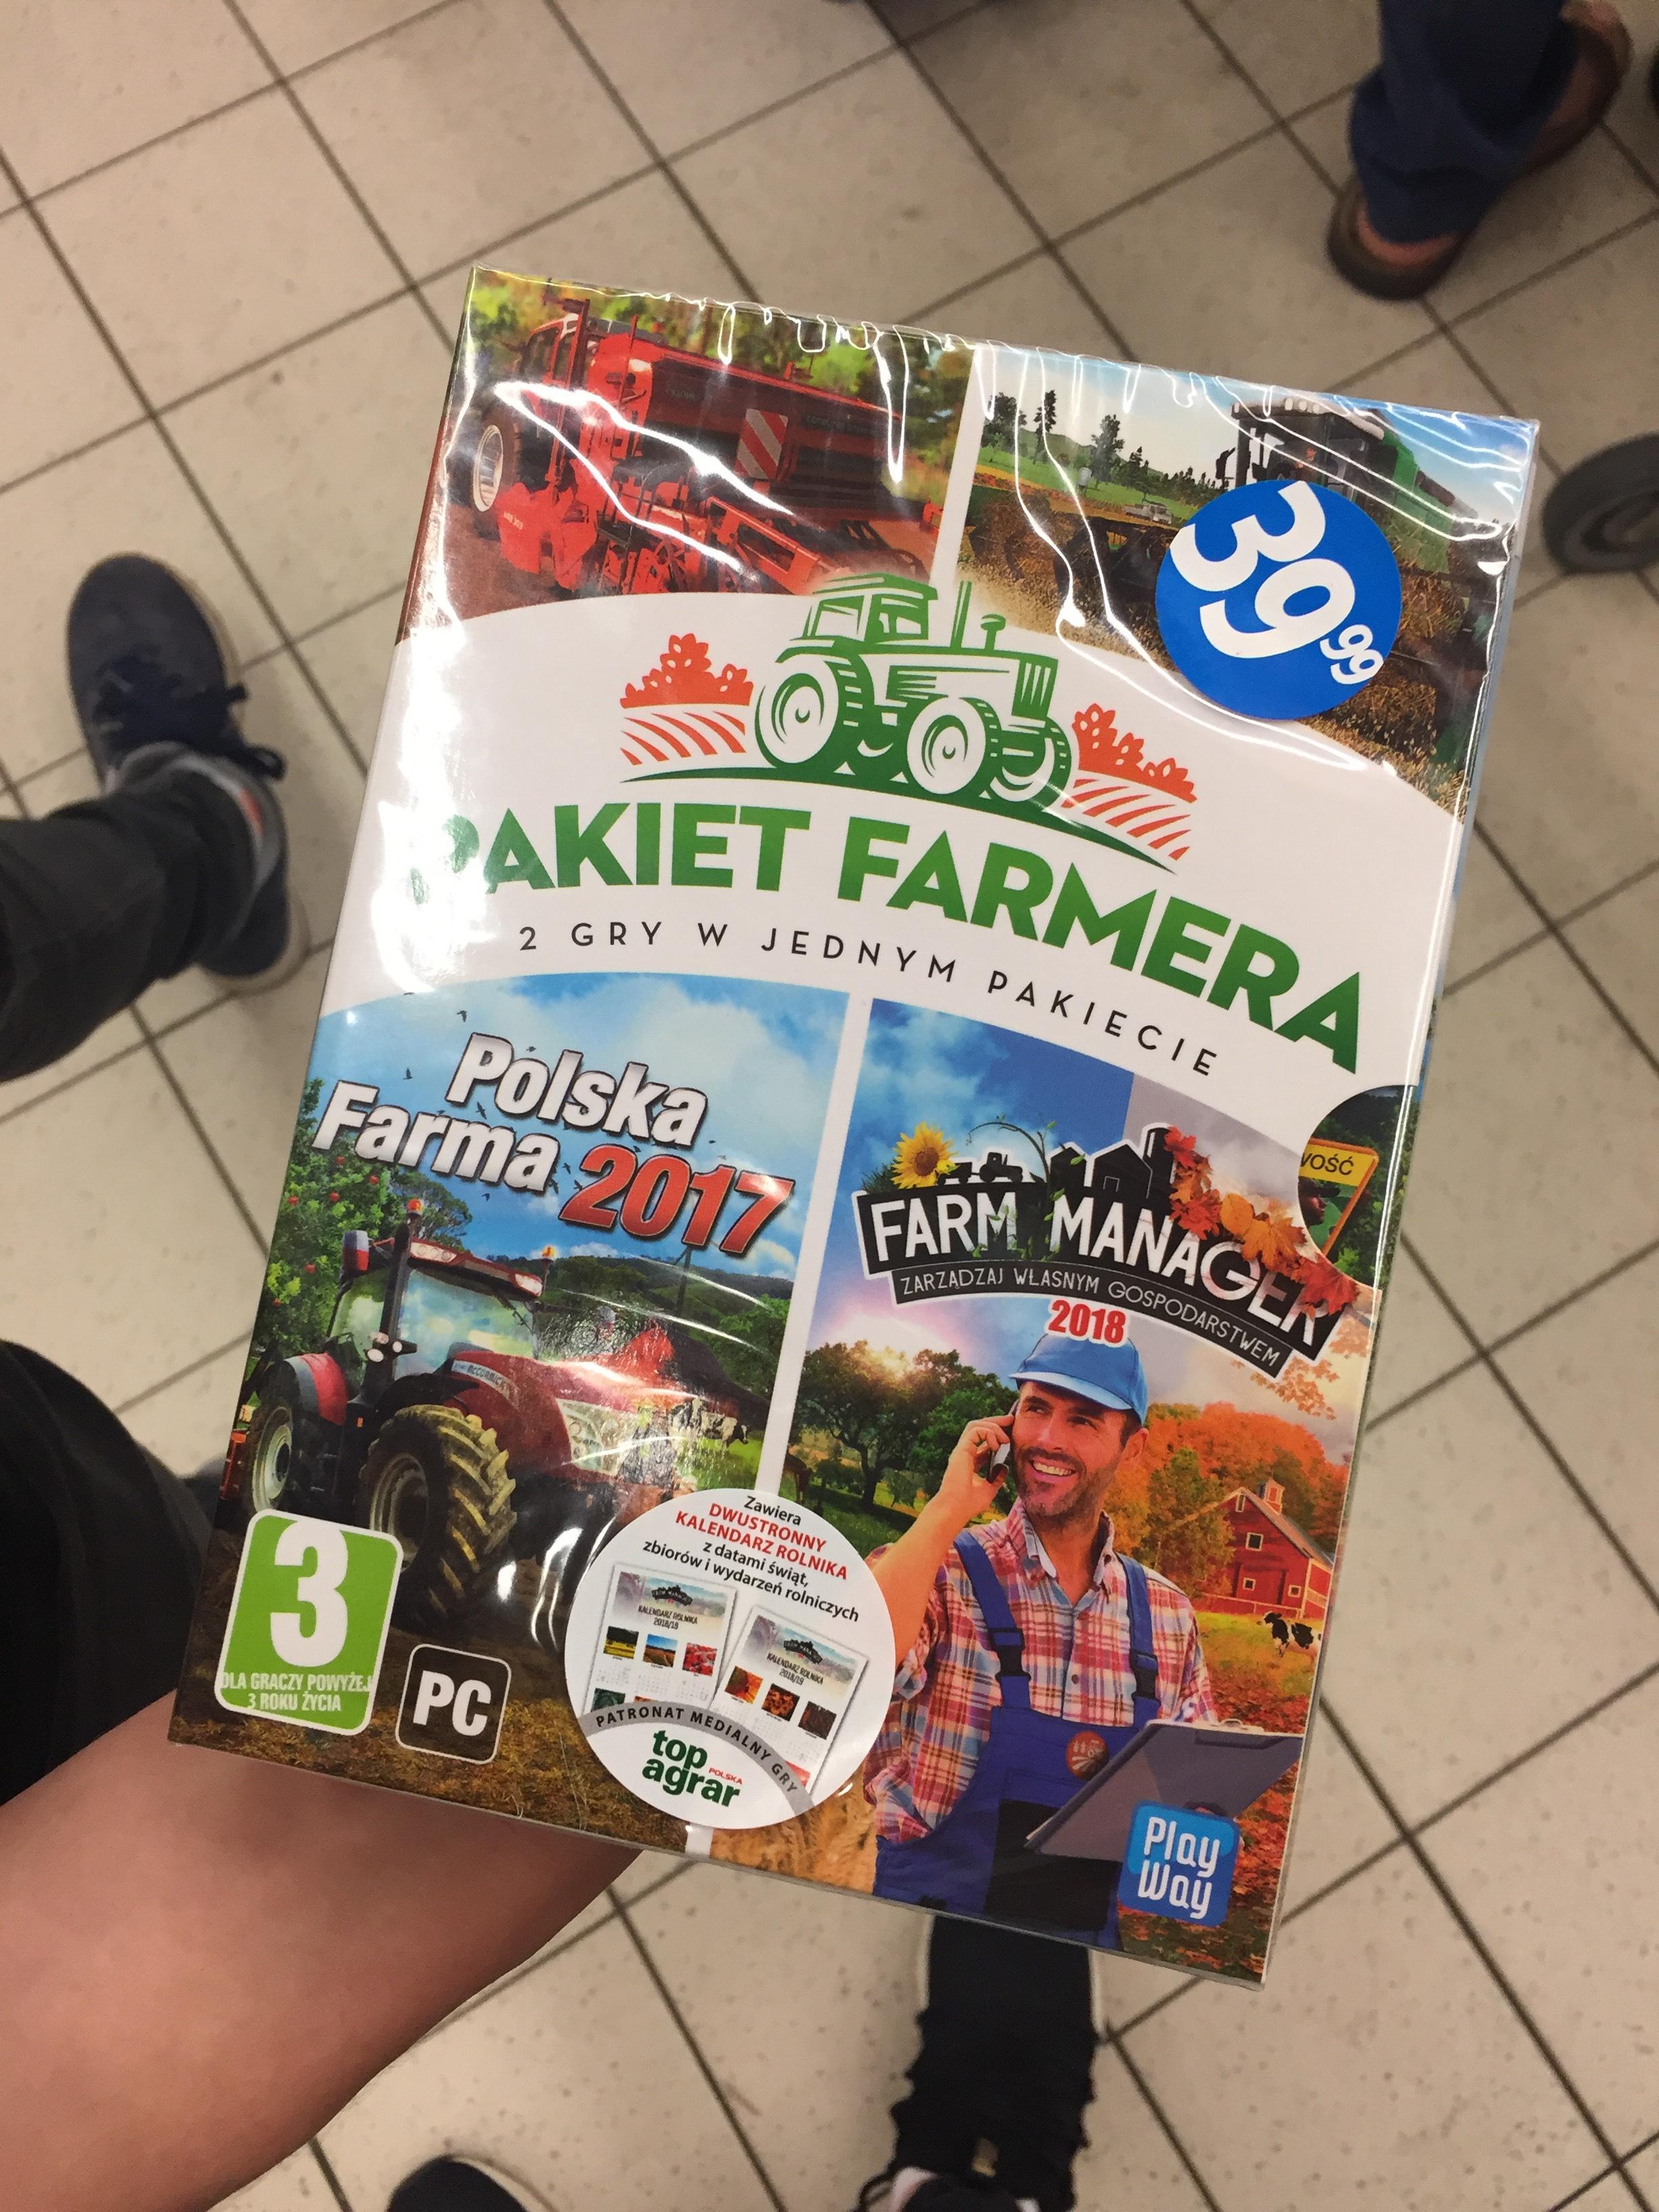 Pakiet Farmera | Polska Farma (Farm Expert) oraz Farm Manager 2018 | Biedronka